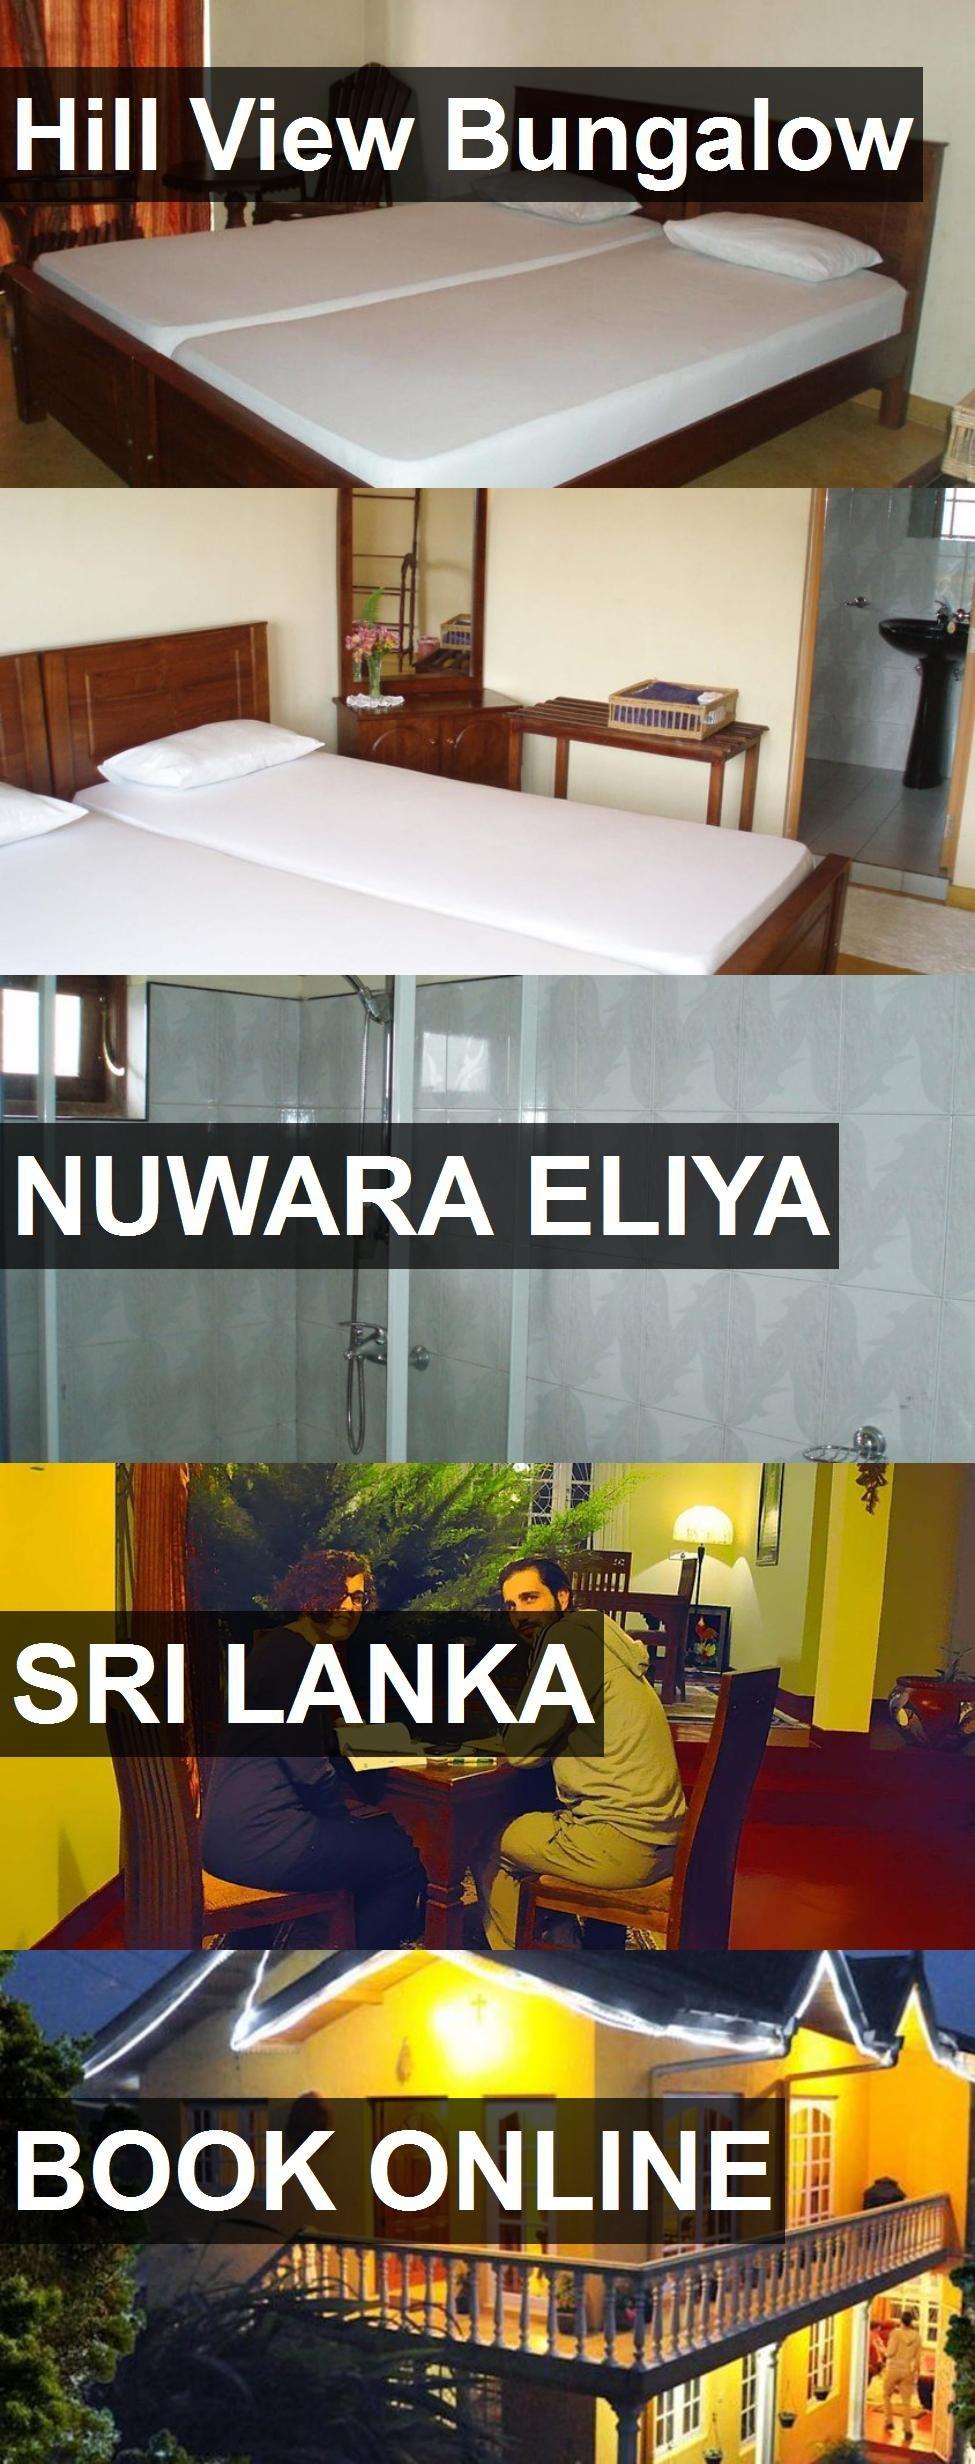 Hotel Hill View Bungalow in Nuwara Eliya, Sri Lanka. For